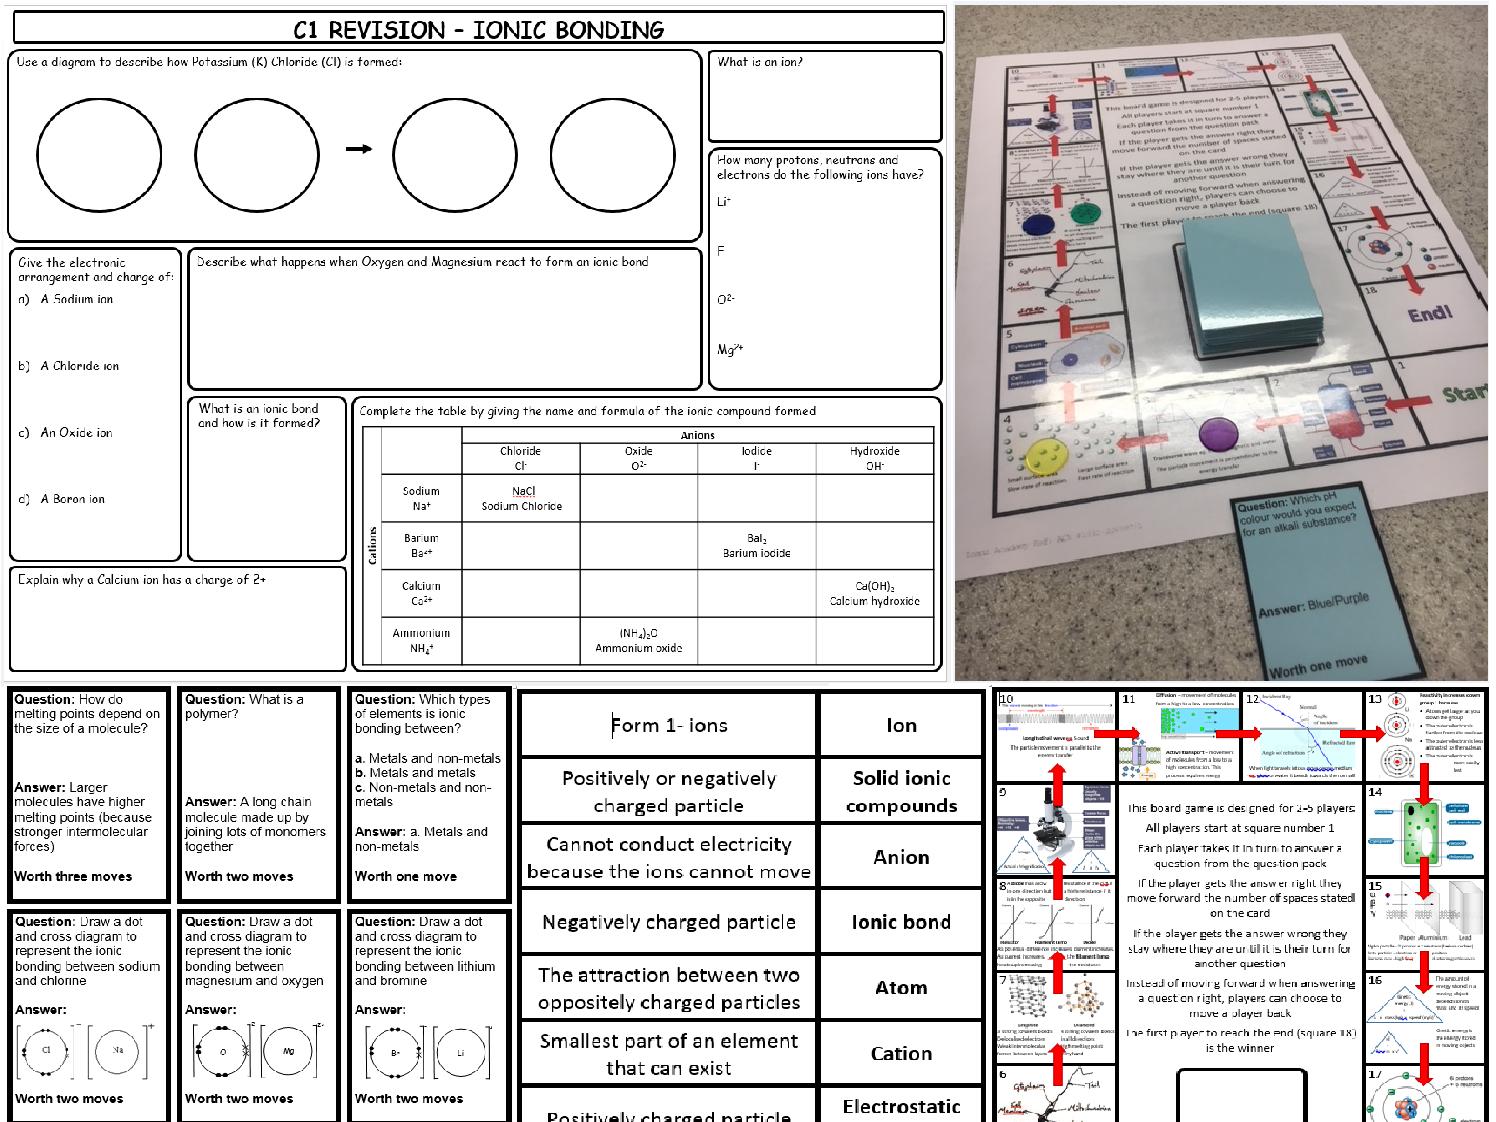 AQA GCSE 9-1 trilogy Chemical bonding revision pack